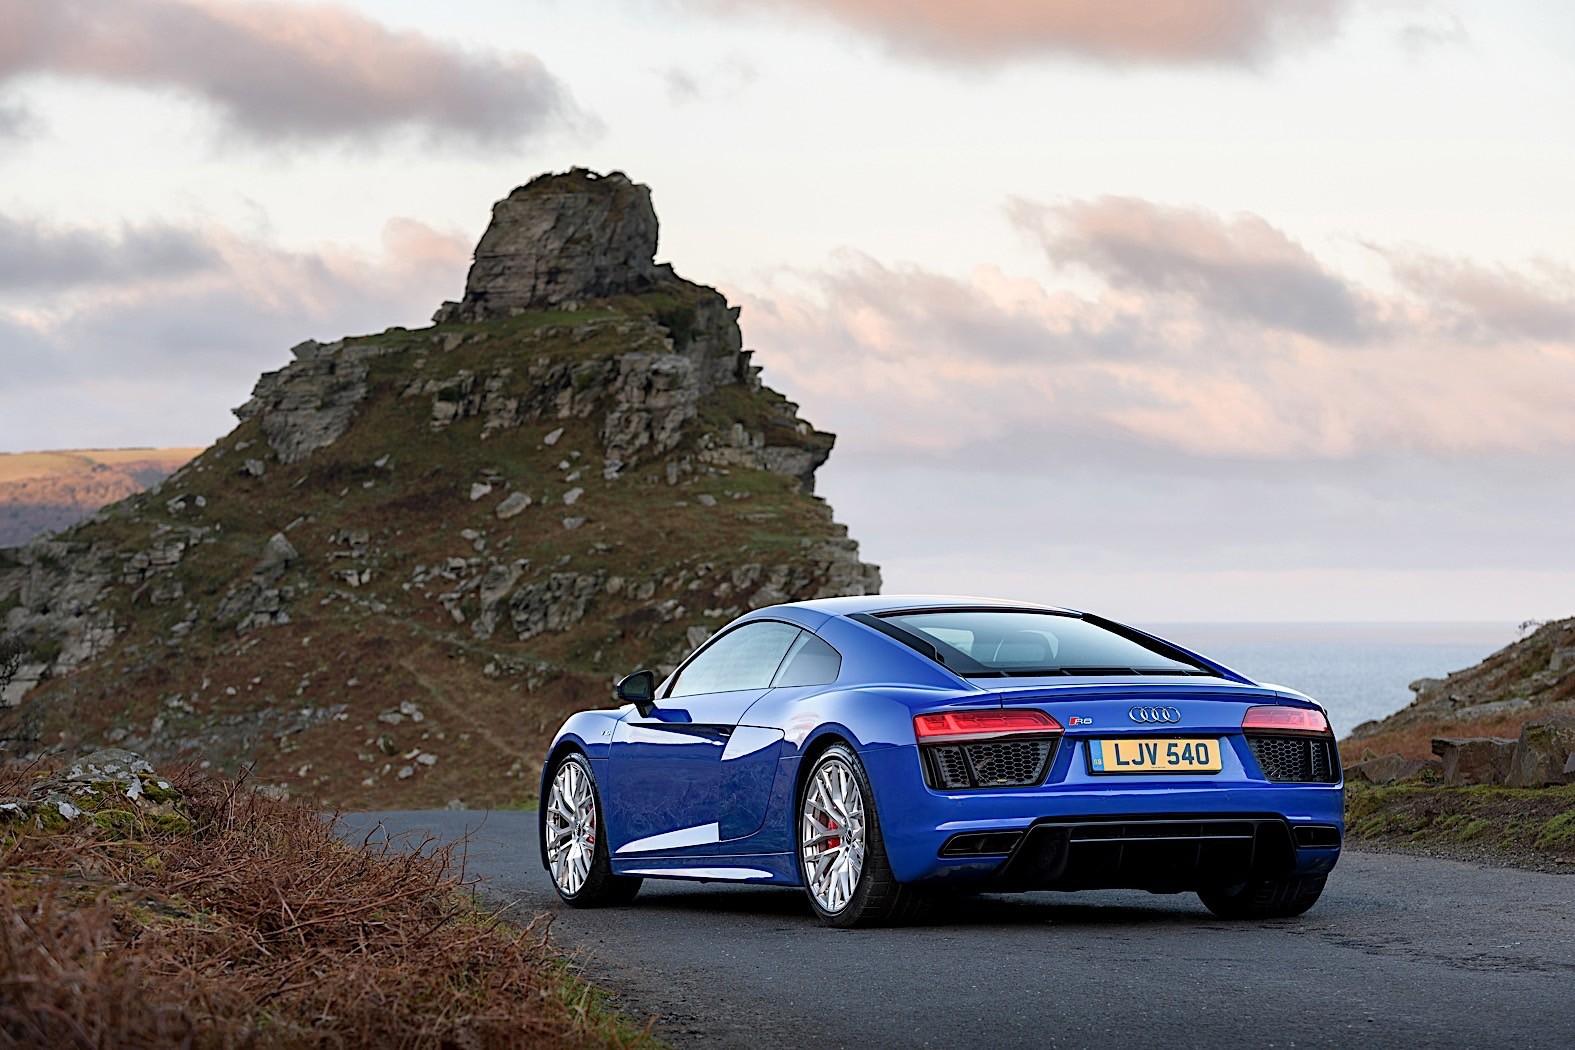 Audi R8 Lms >> Audi R8 Limited Rear Wheel Series Released in UK ...